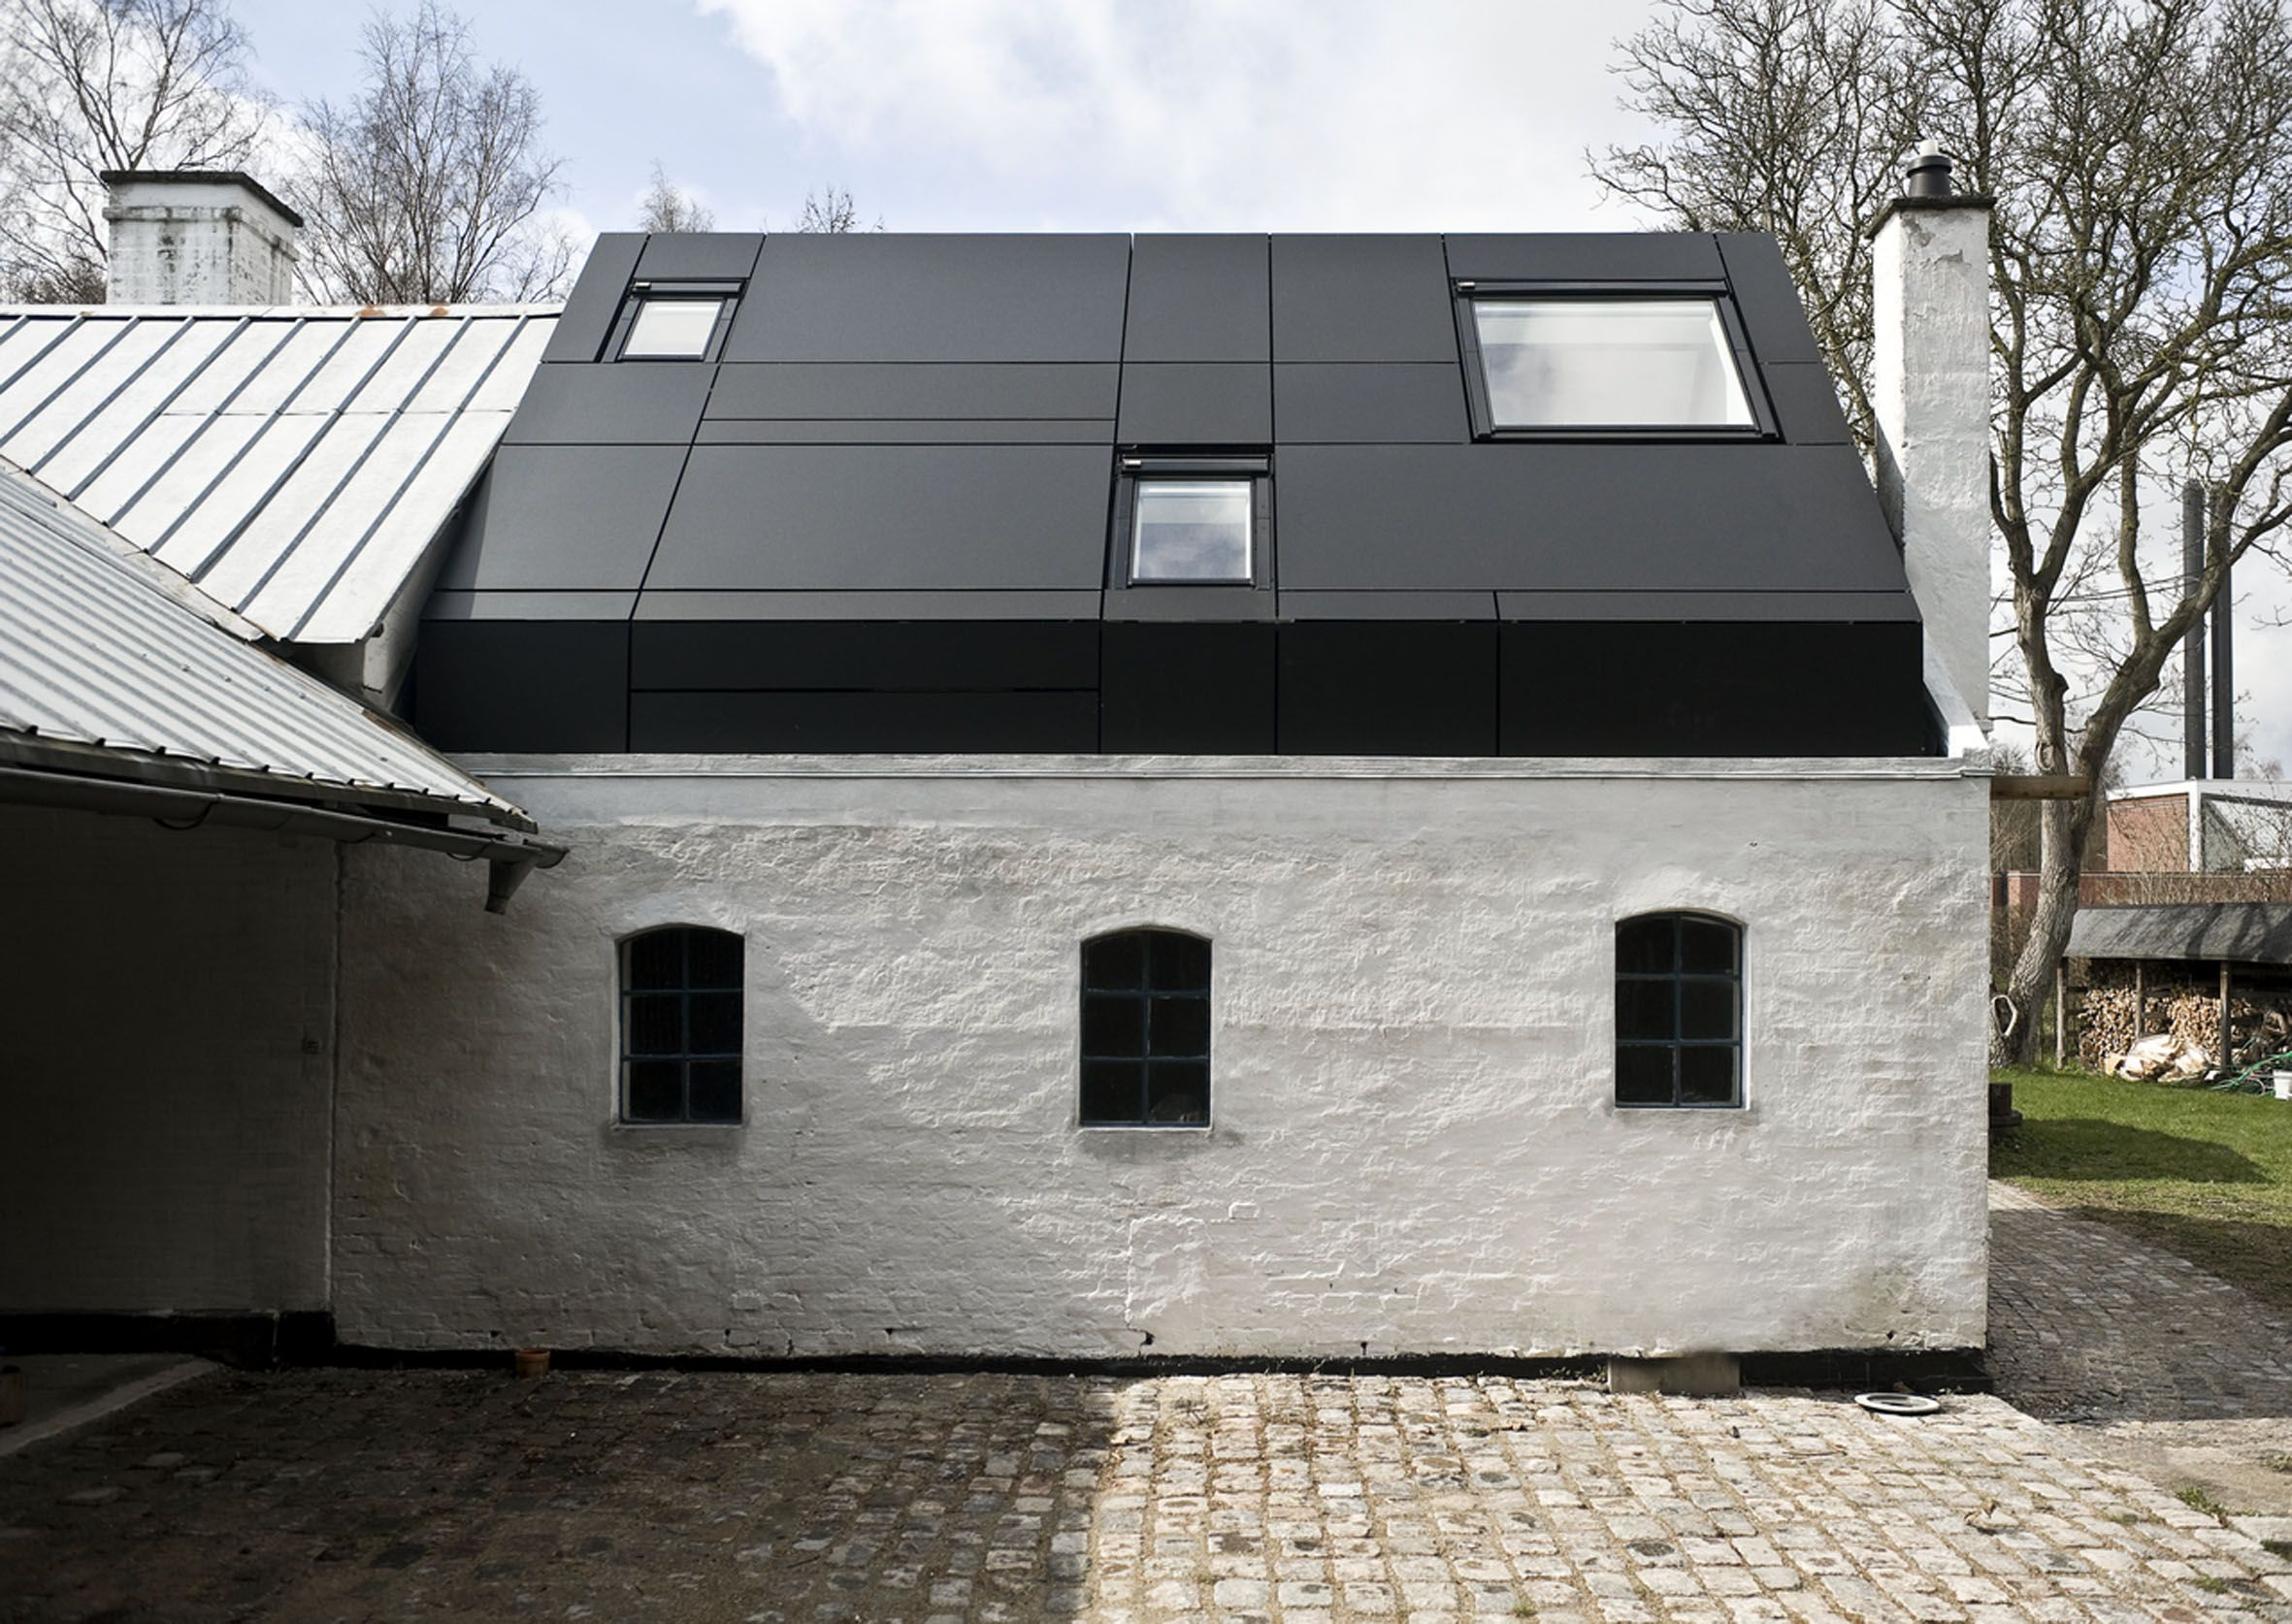 Rotterdam, Ateliers and Utrecht on Pinterest